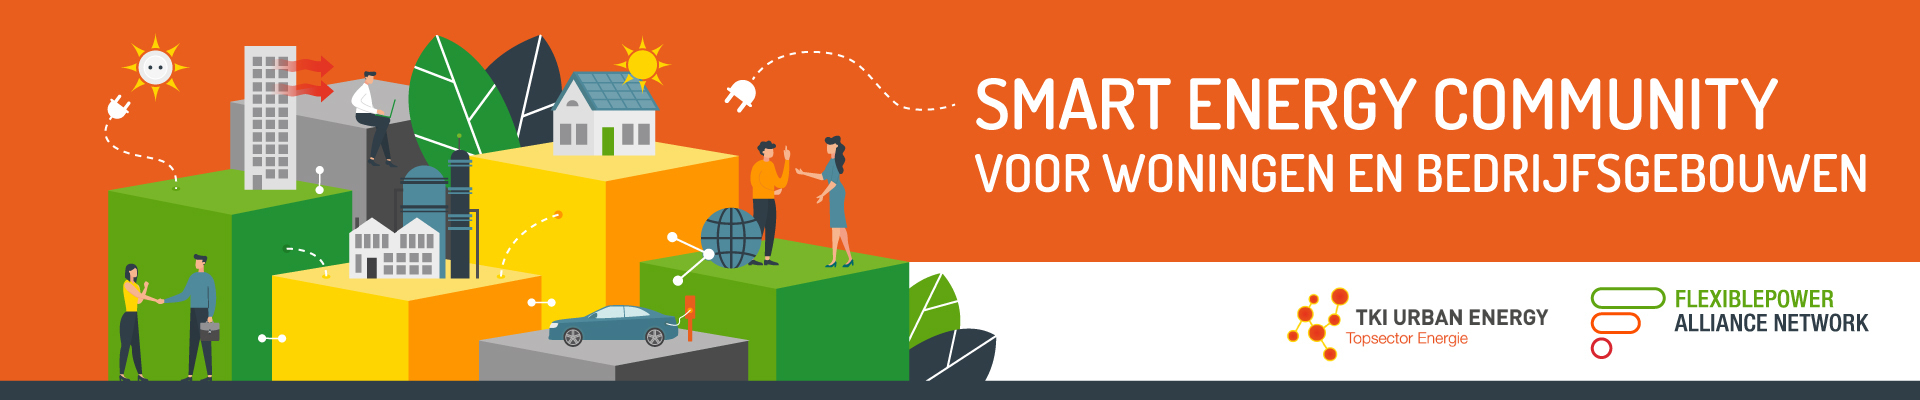 Smart Energy Community 2